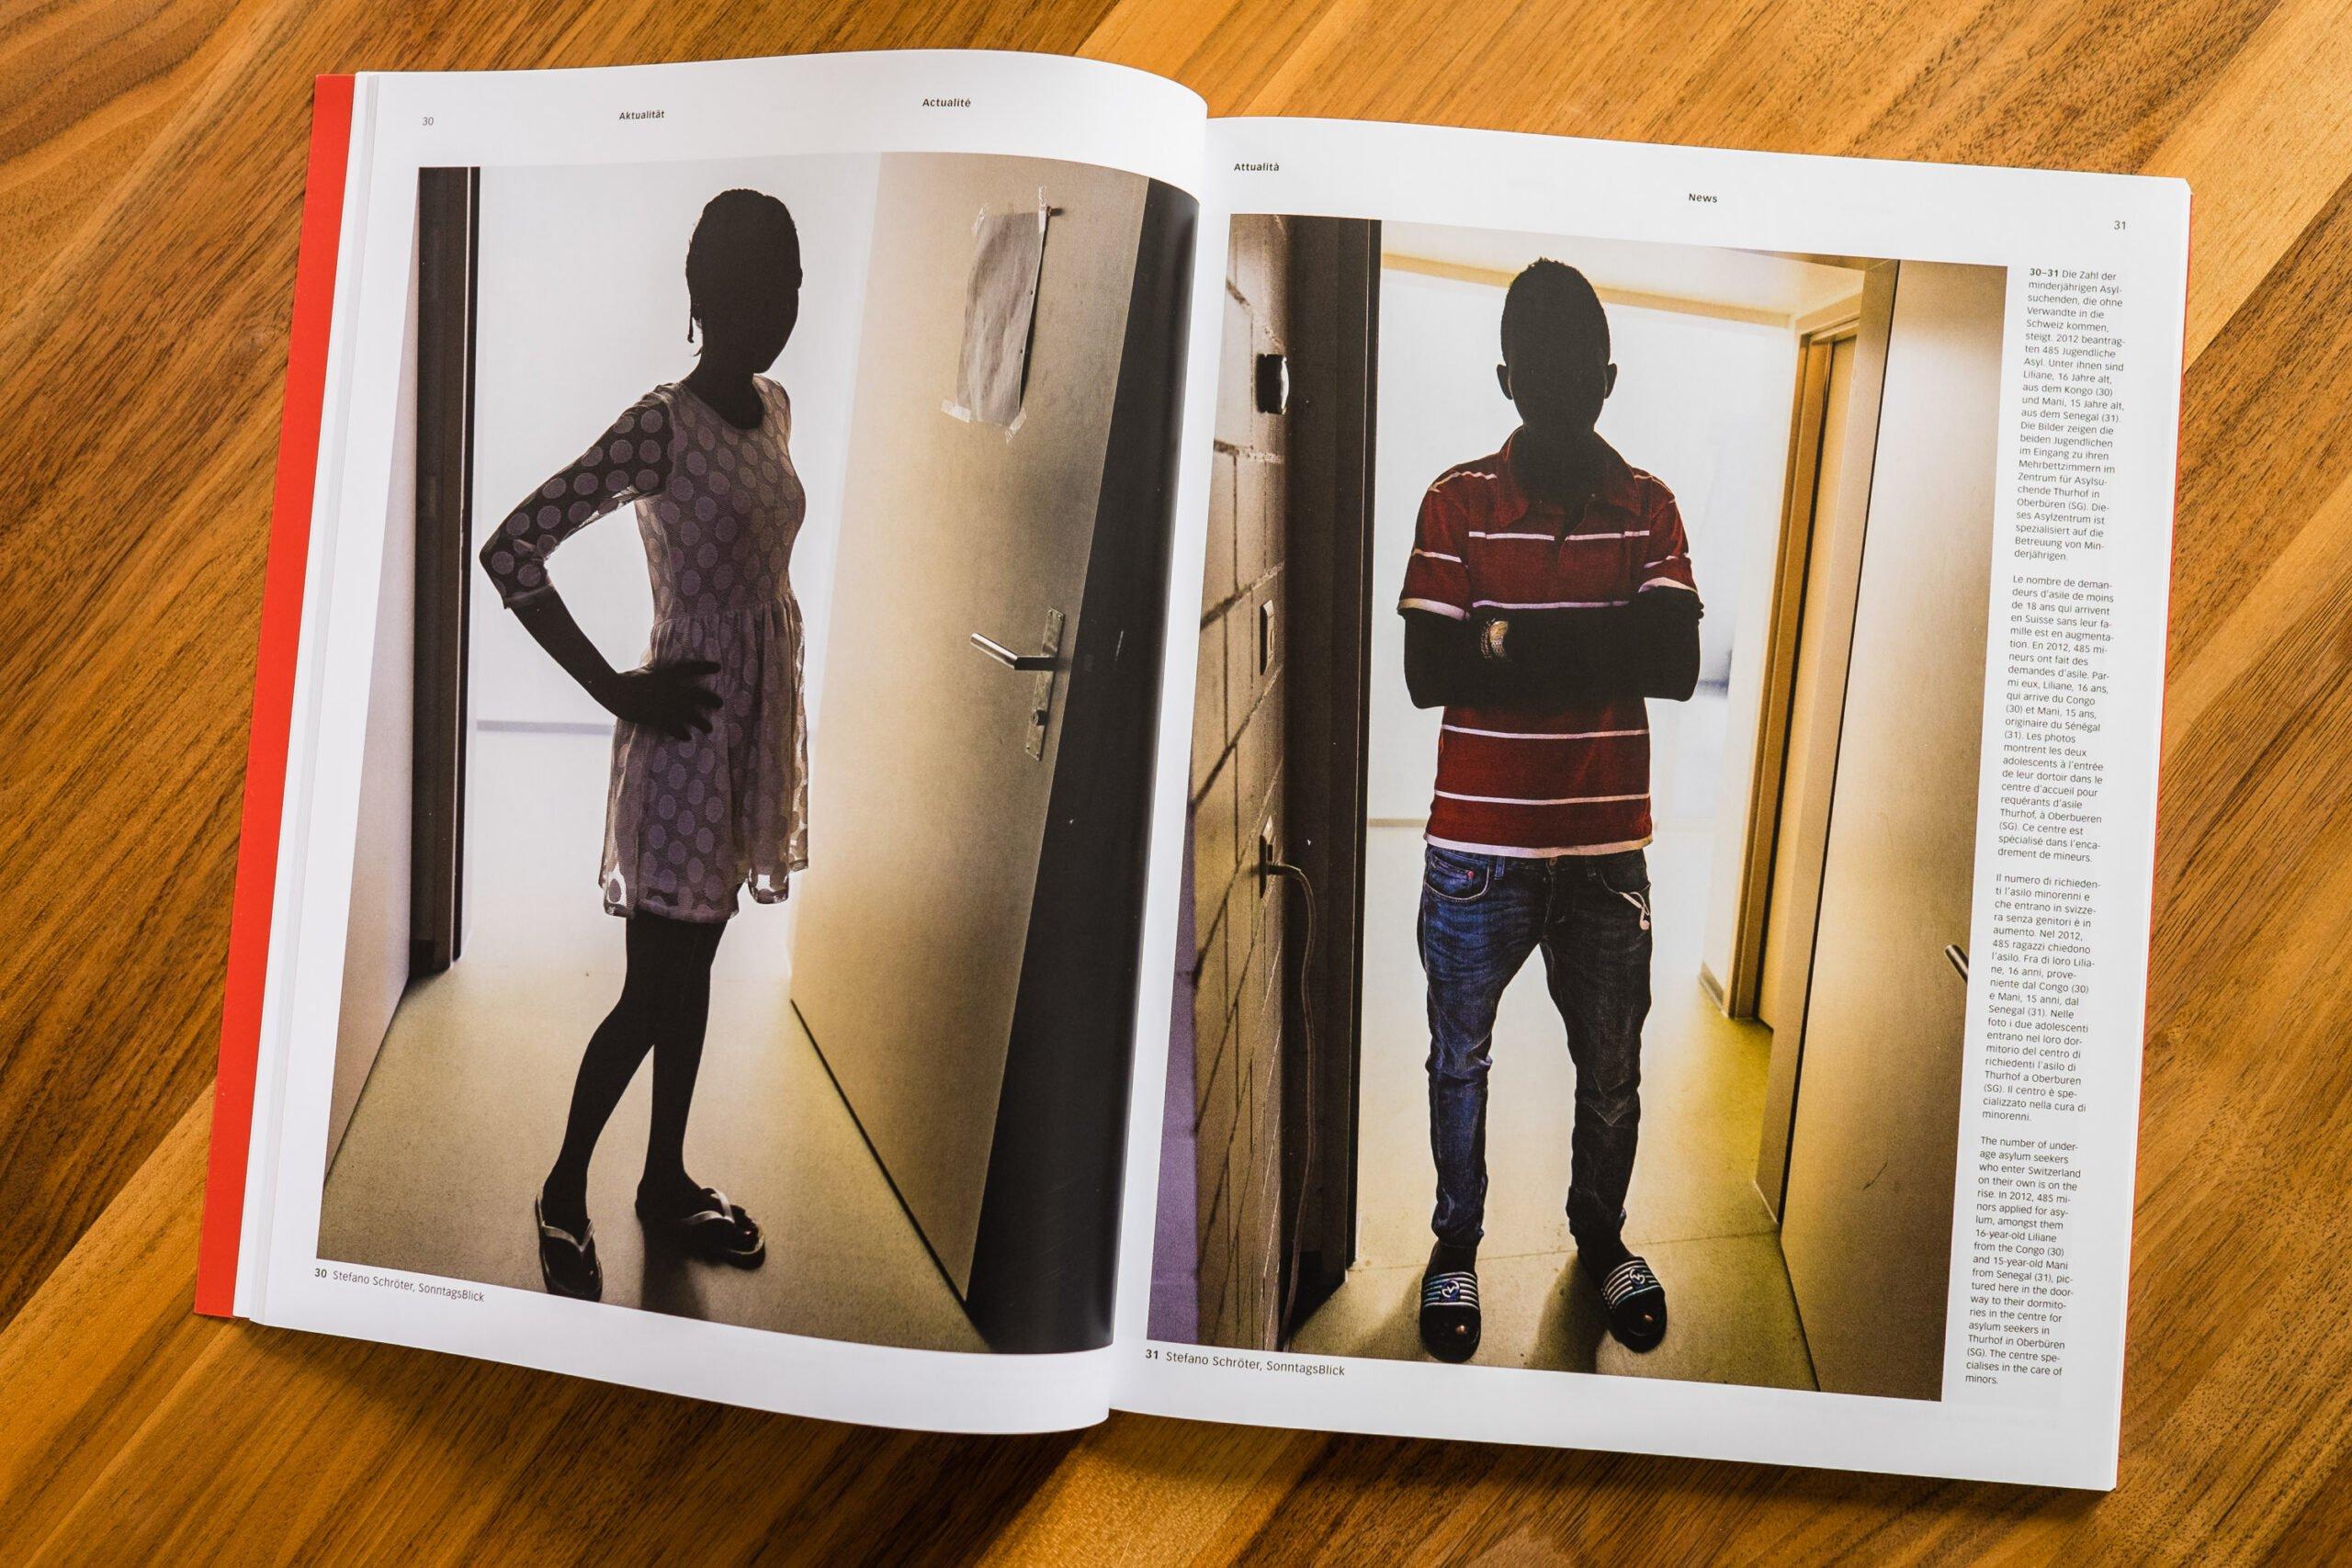 Portraits minderjähriger Aylsuchender